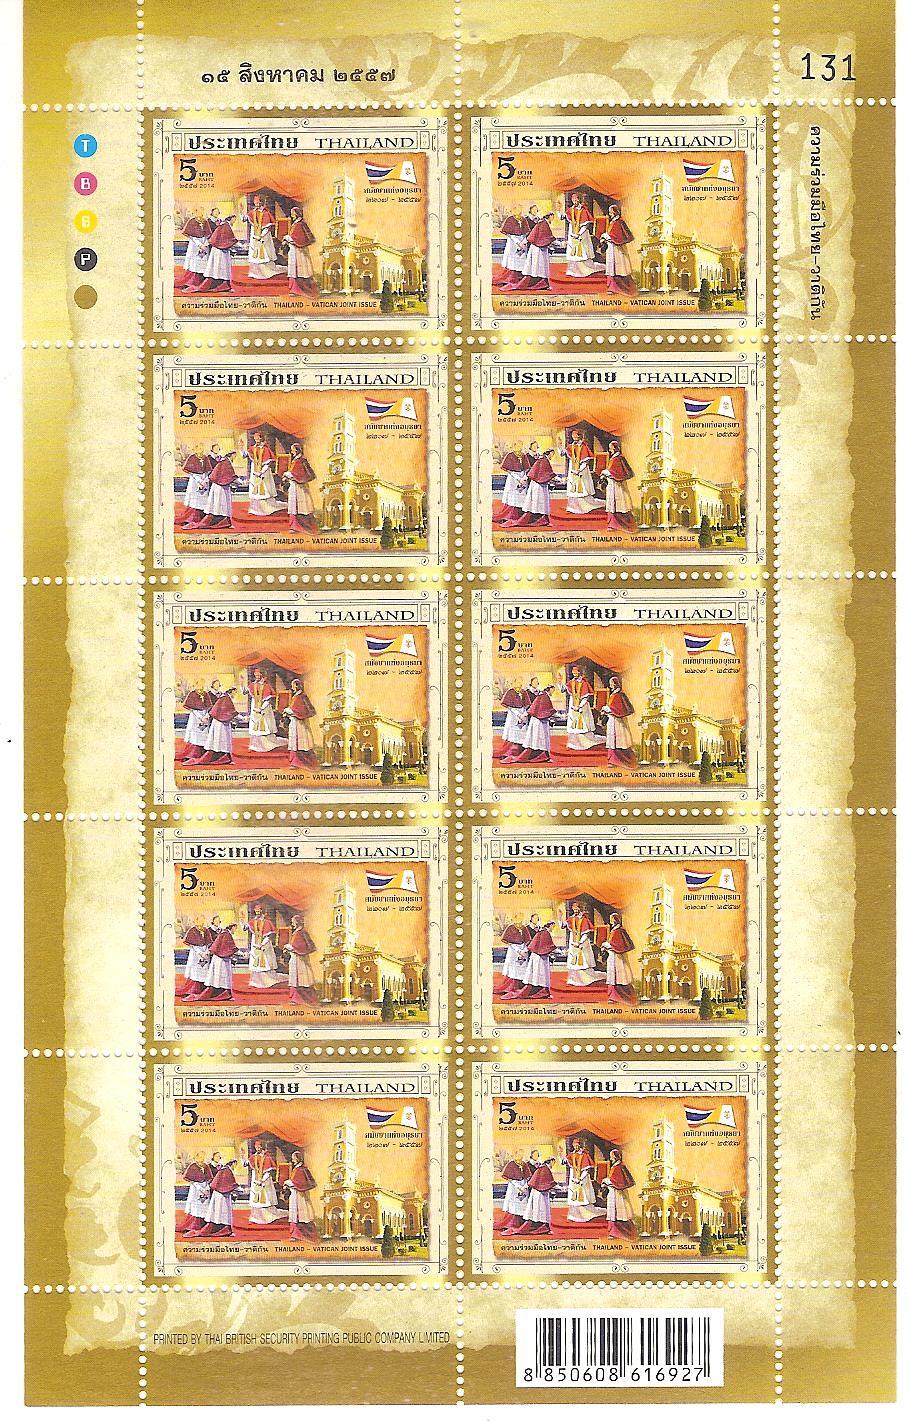 thailandia congiunta vaticano 001